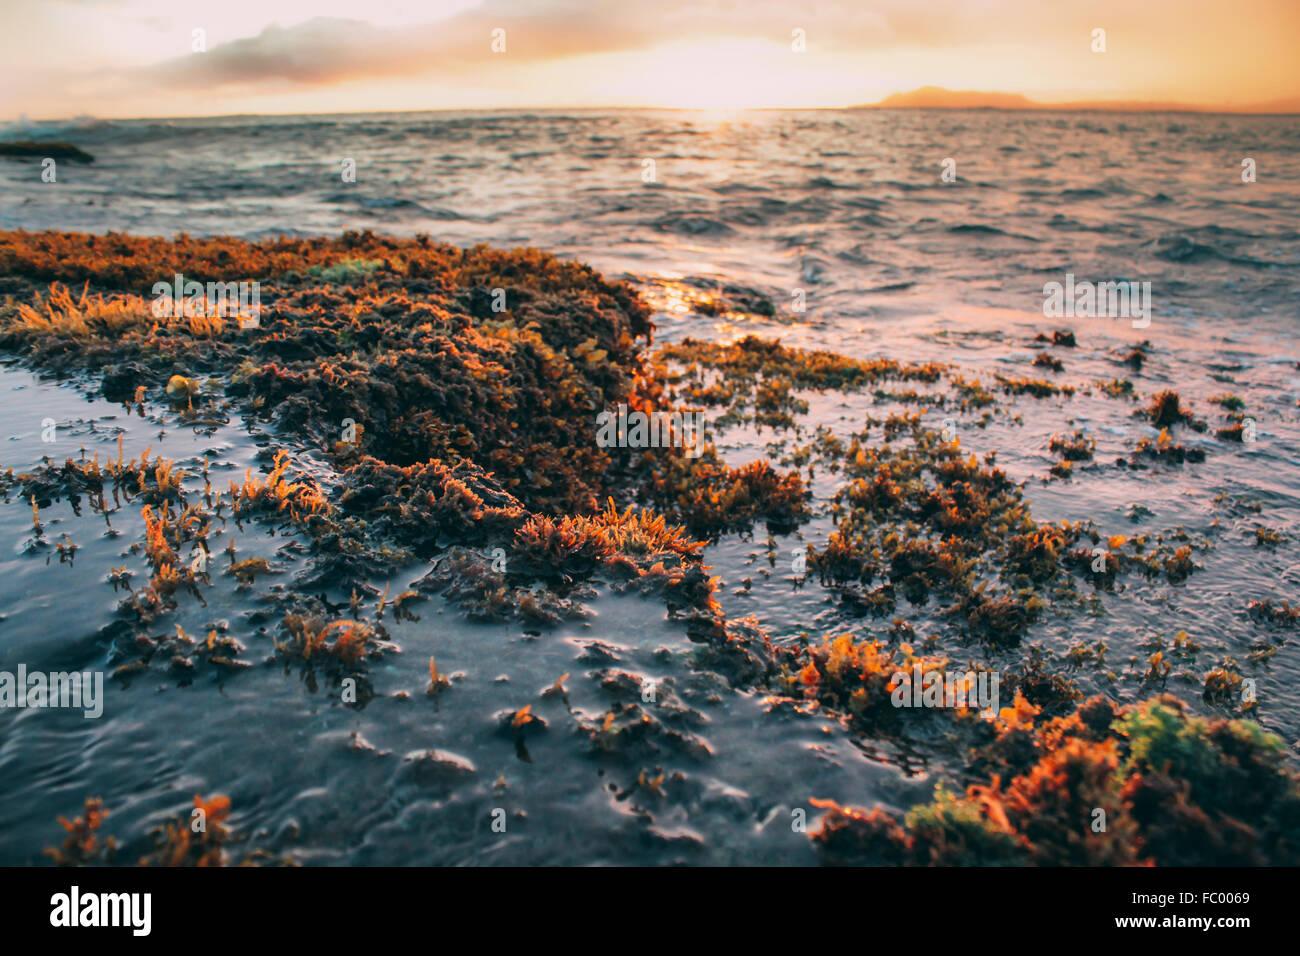 Coral en marea baja sobre Portlock Oahu Hawai USA stock photo. Imagen De Stock